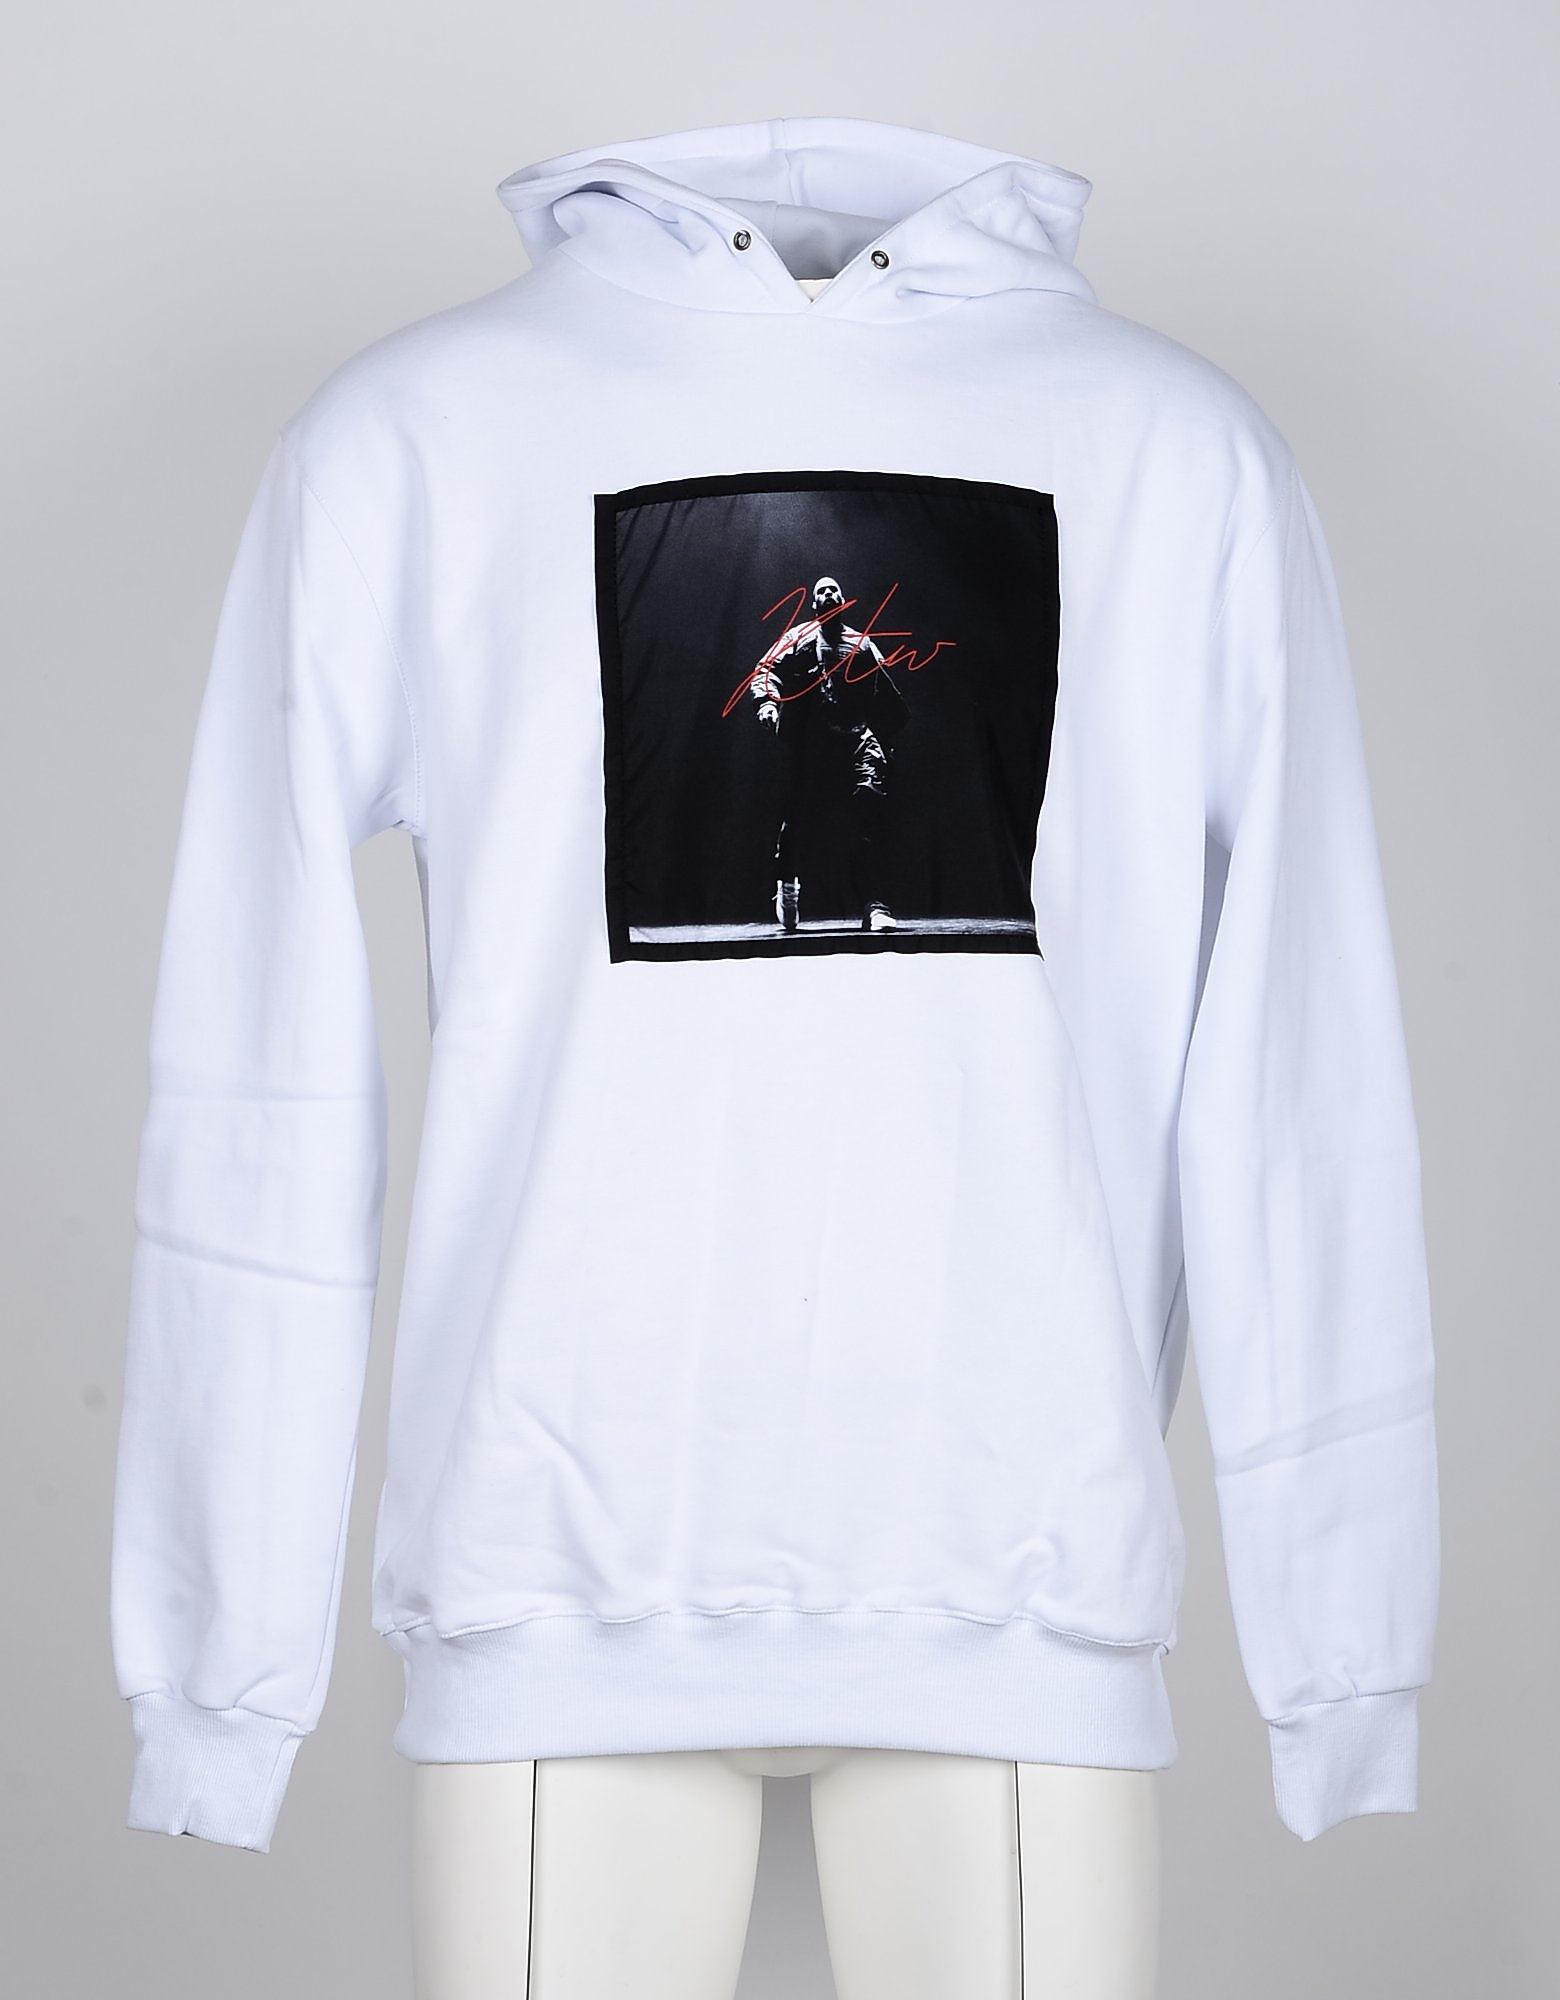 Kissing the War Designer Sweatshirts, White Cotton Signature Print Men's Hoodie